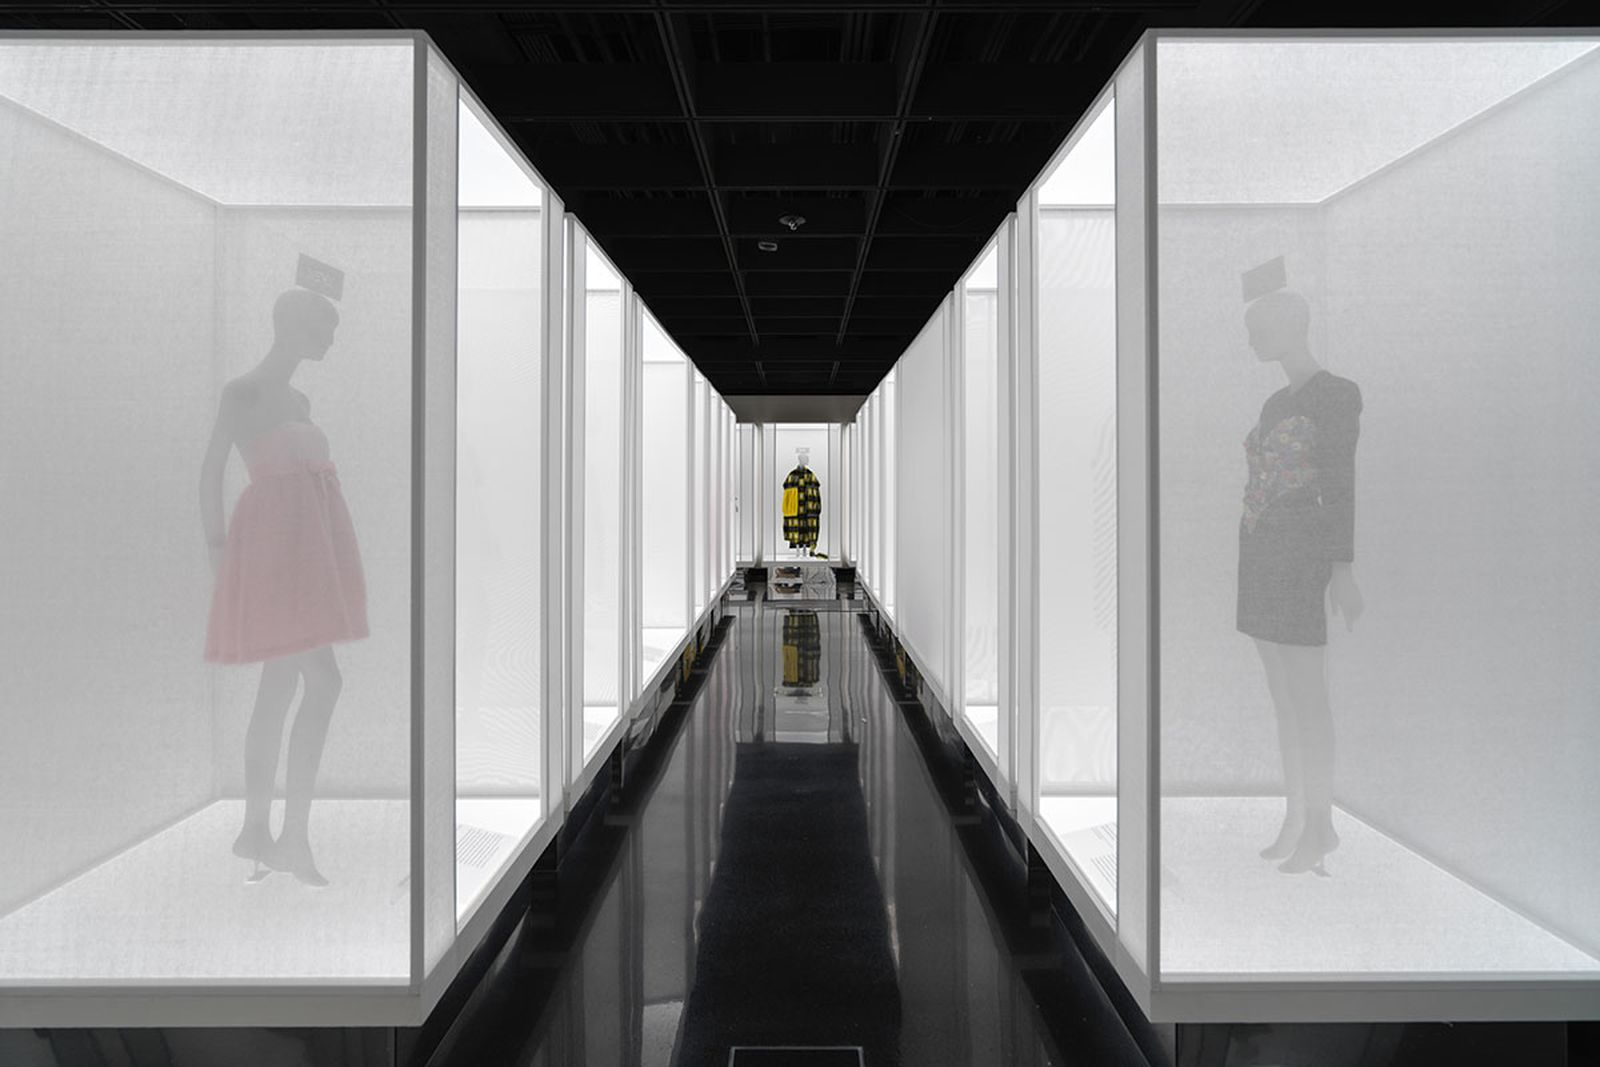 View Gallery, Wonder (left), Heat (center), Joy (right)